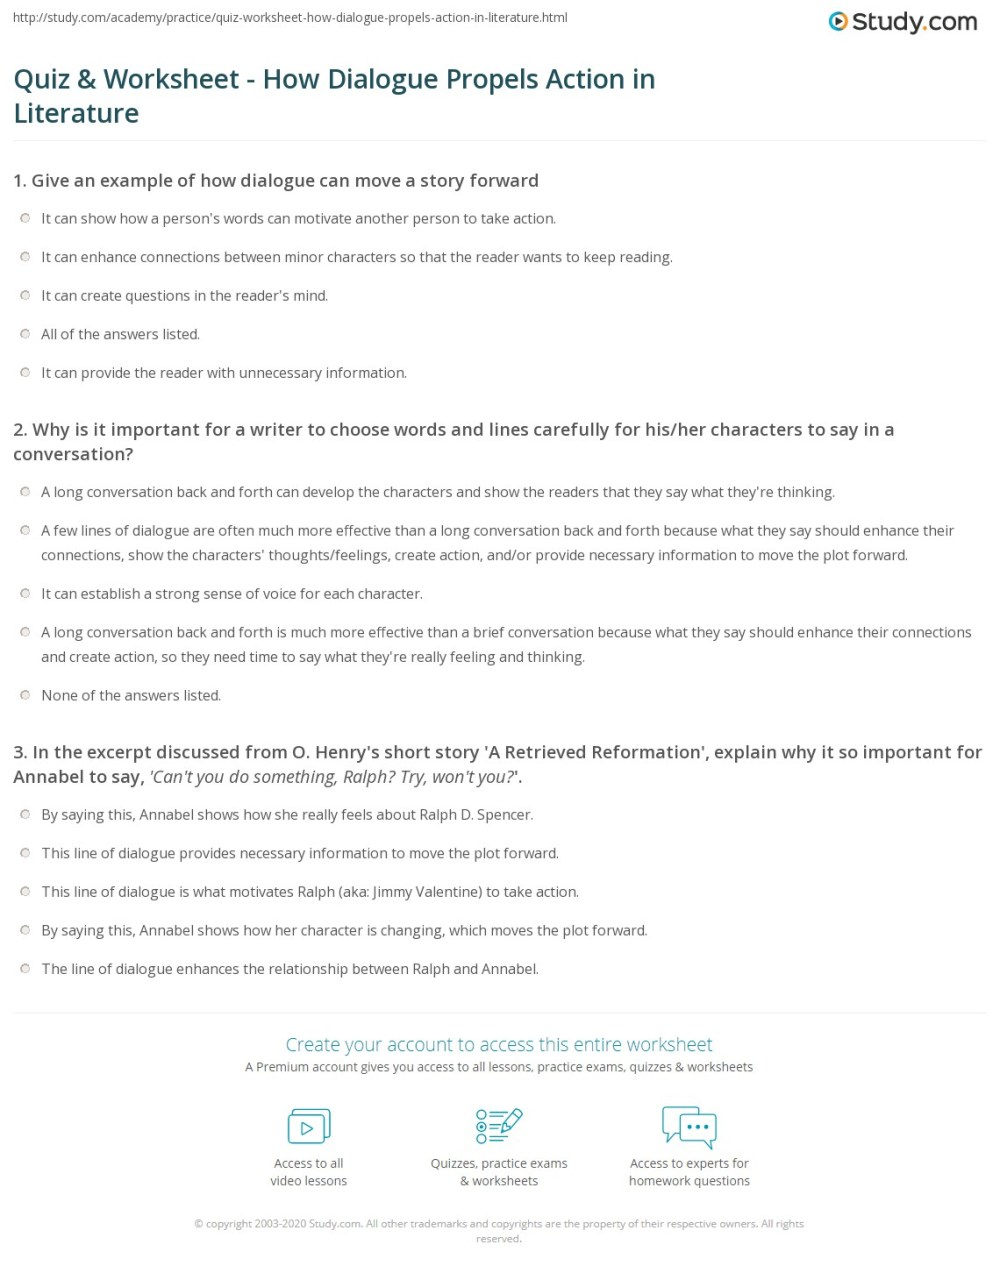 medium resolution of Quiz \u0026 Worksheet - How Dialogue Propels Action in Literature   Study.com